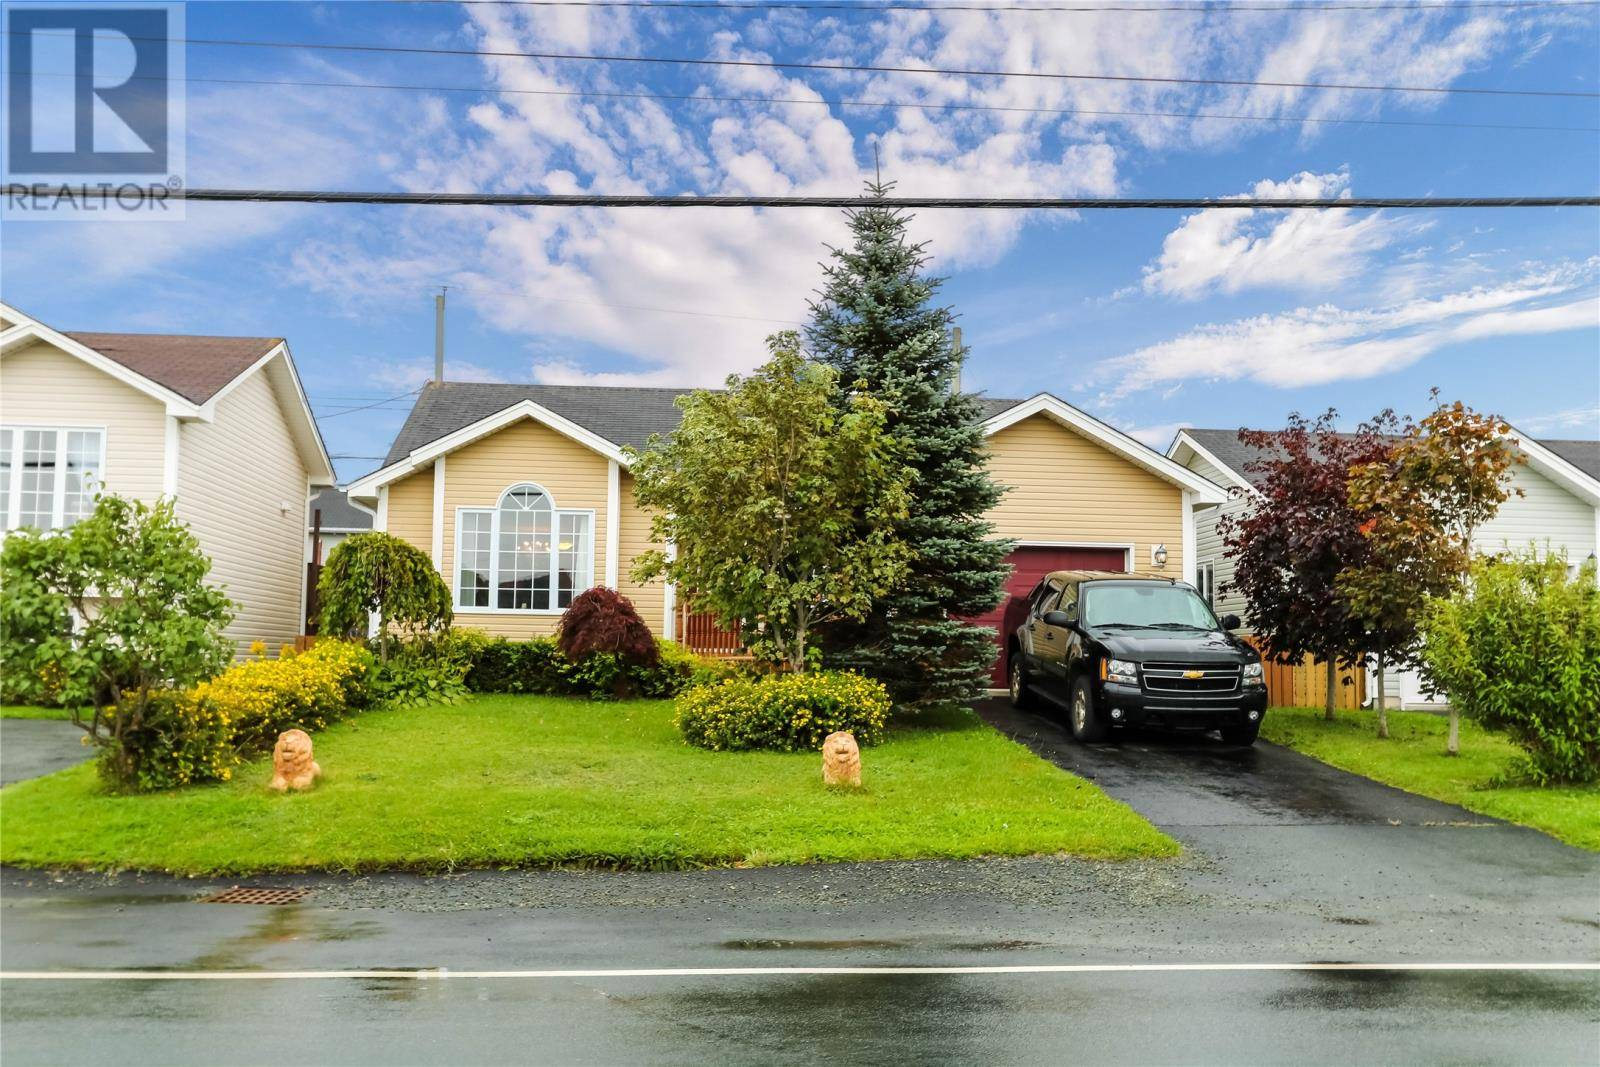 House for sale at 65 Old Bay Bulls Rd St. John's Newfoundland - MLS: 1212582